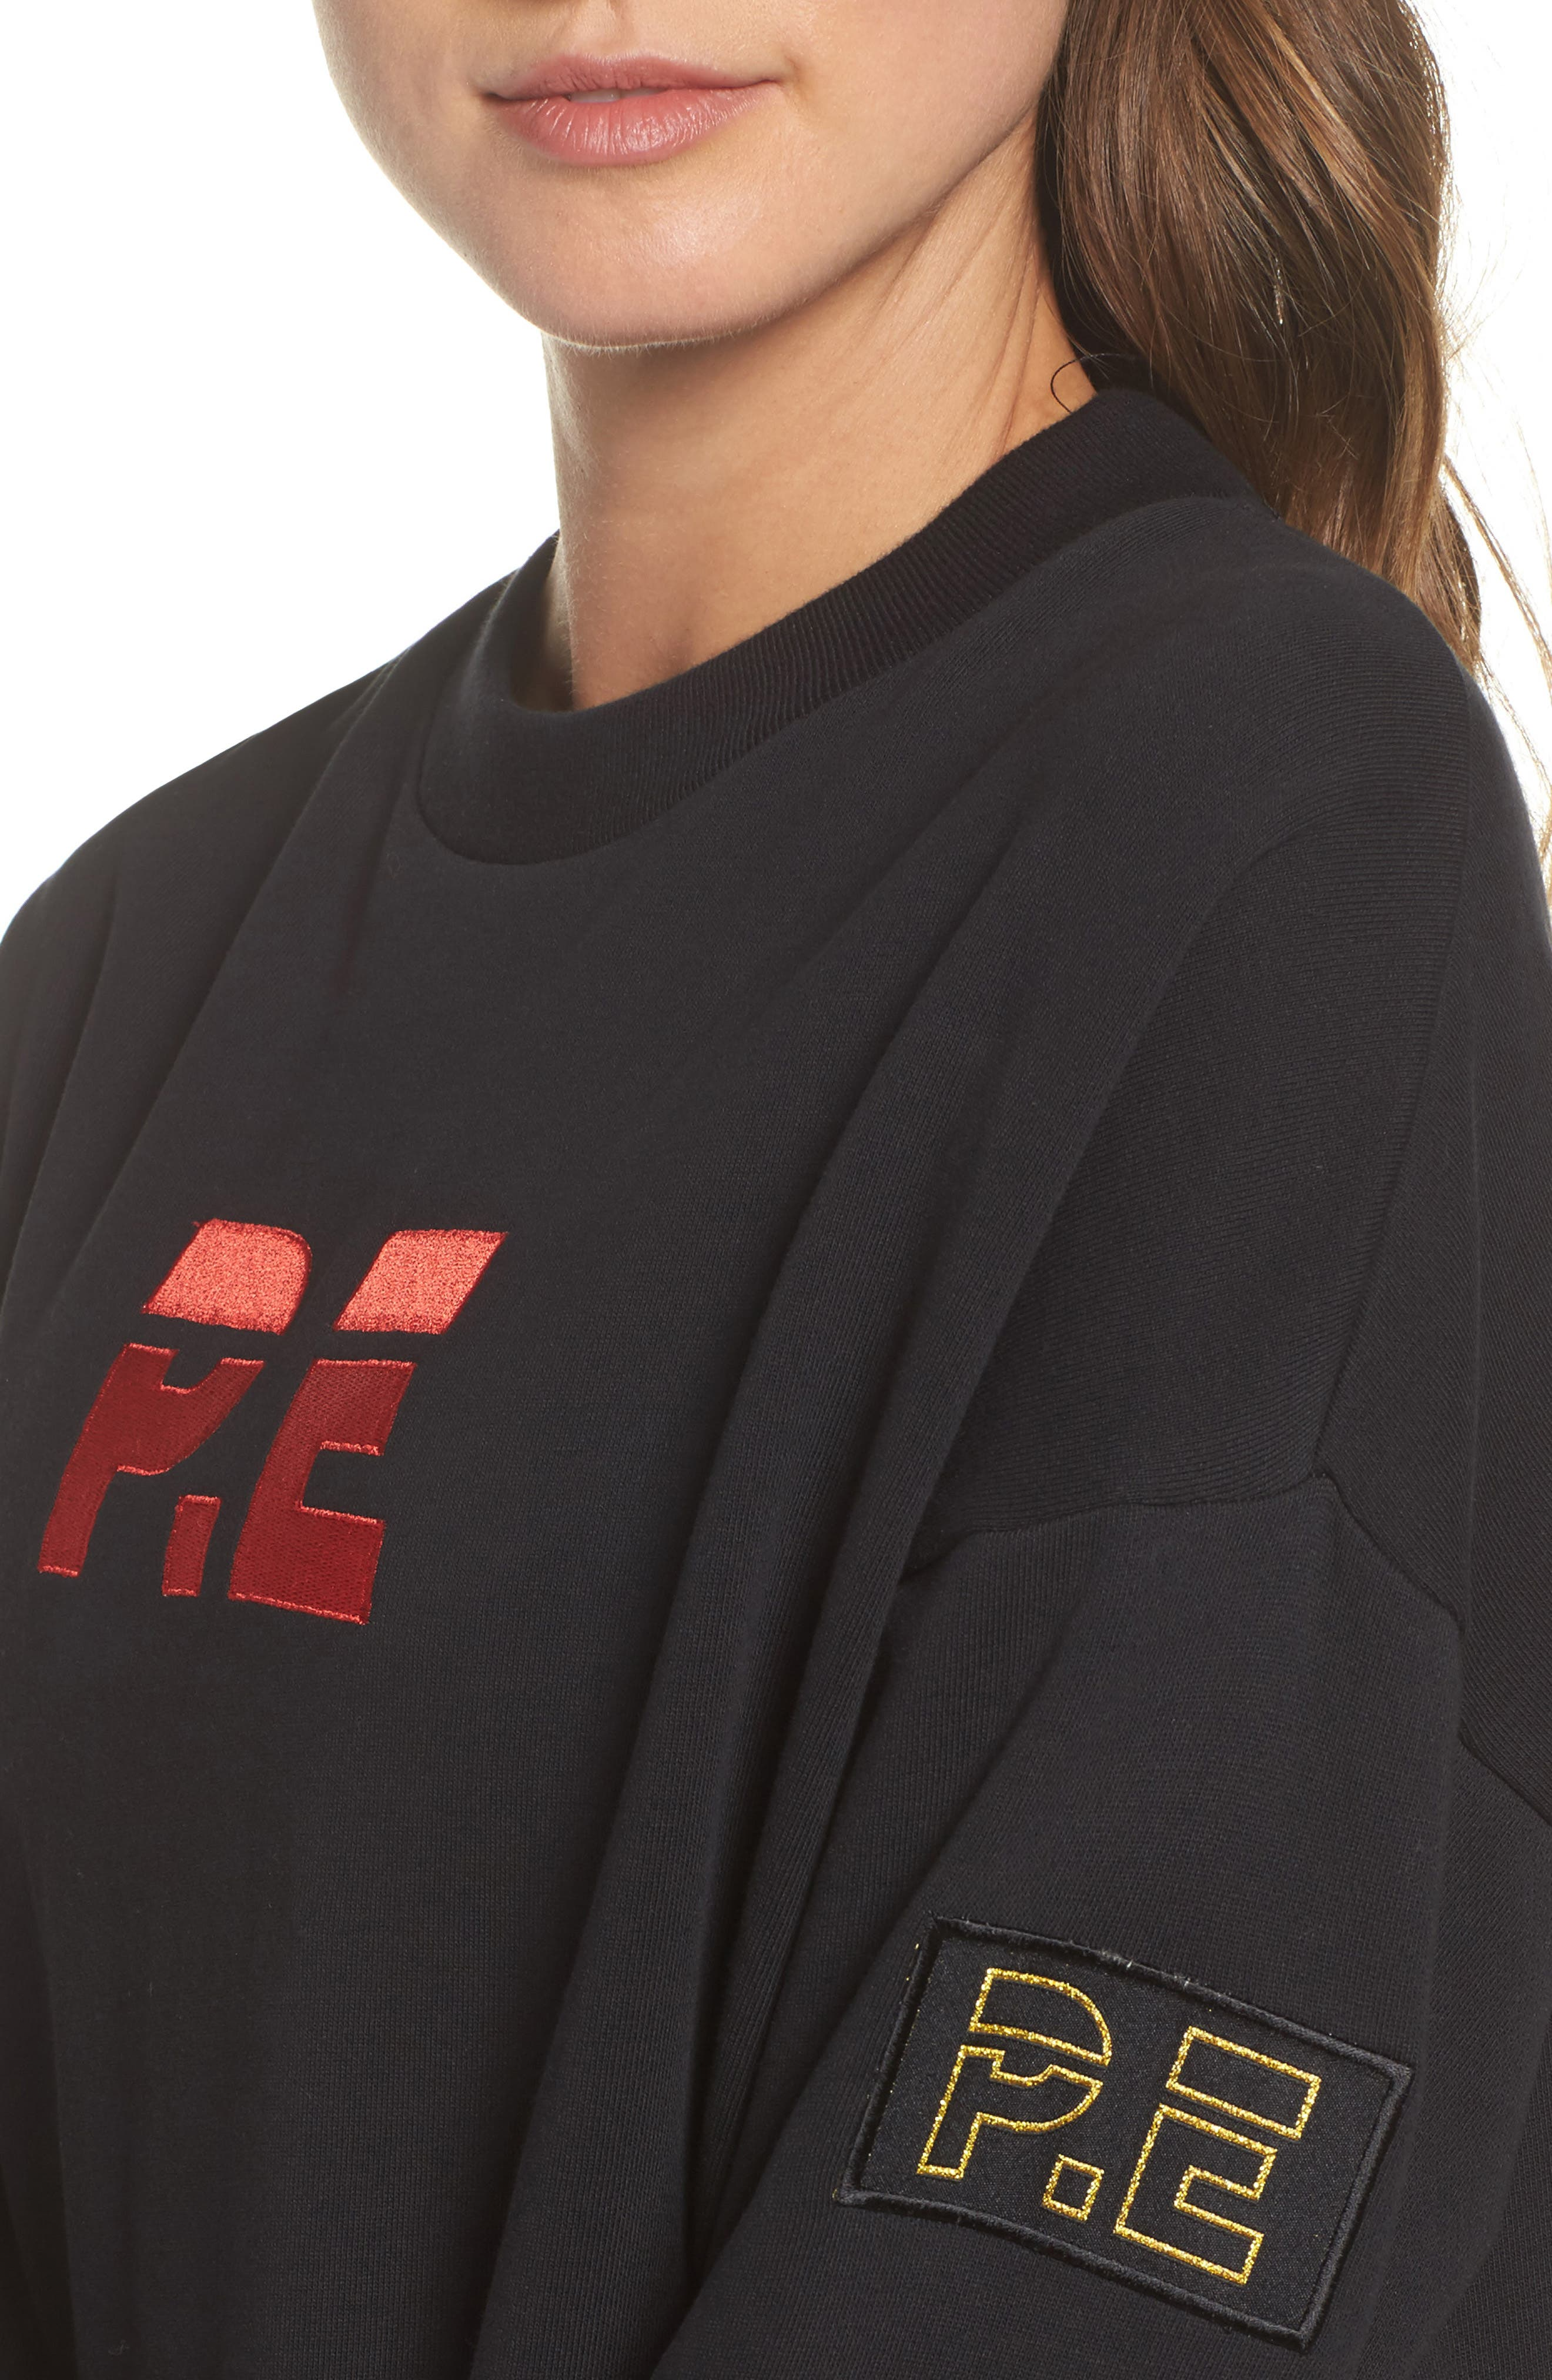 Get Set Sweatshirt,                             Alternate thumbnail 4, color,                             Black